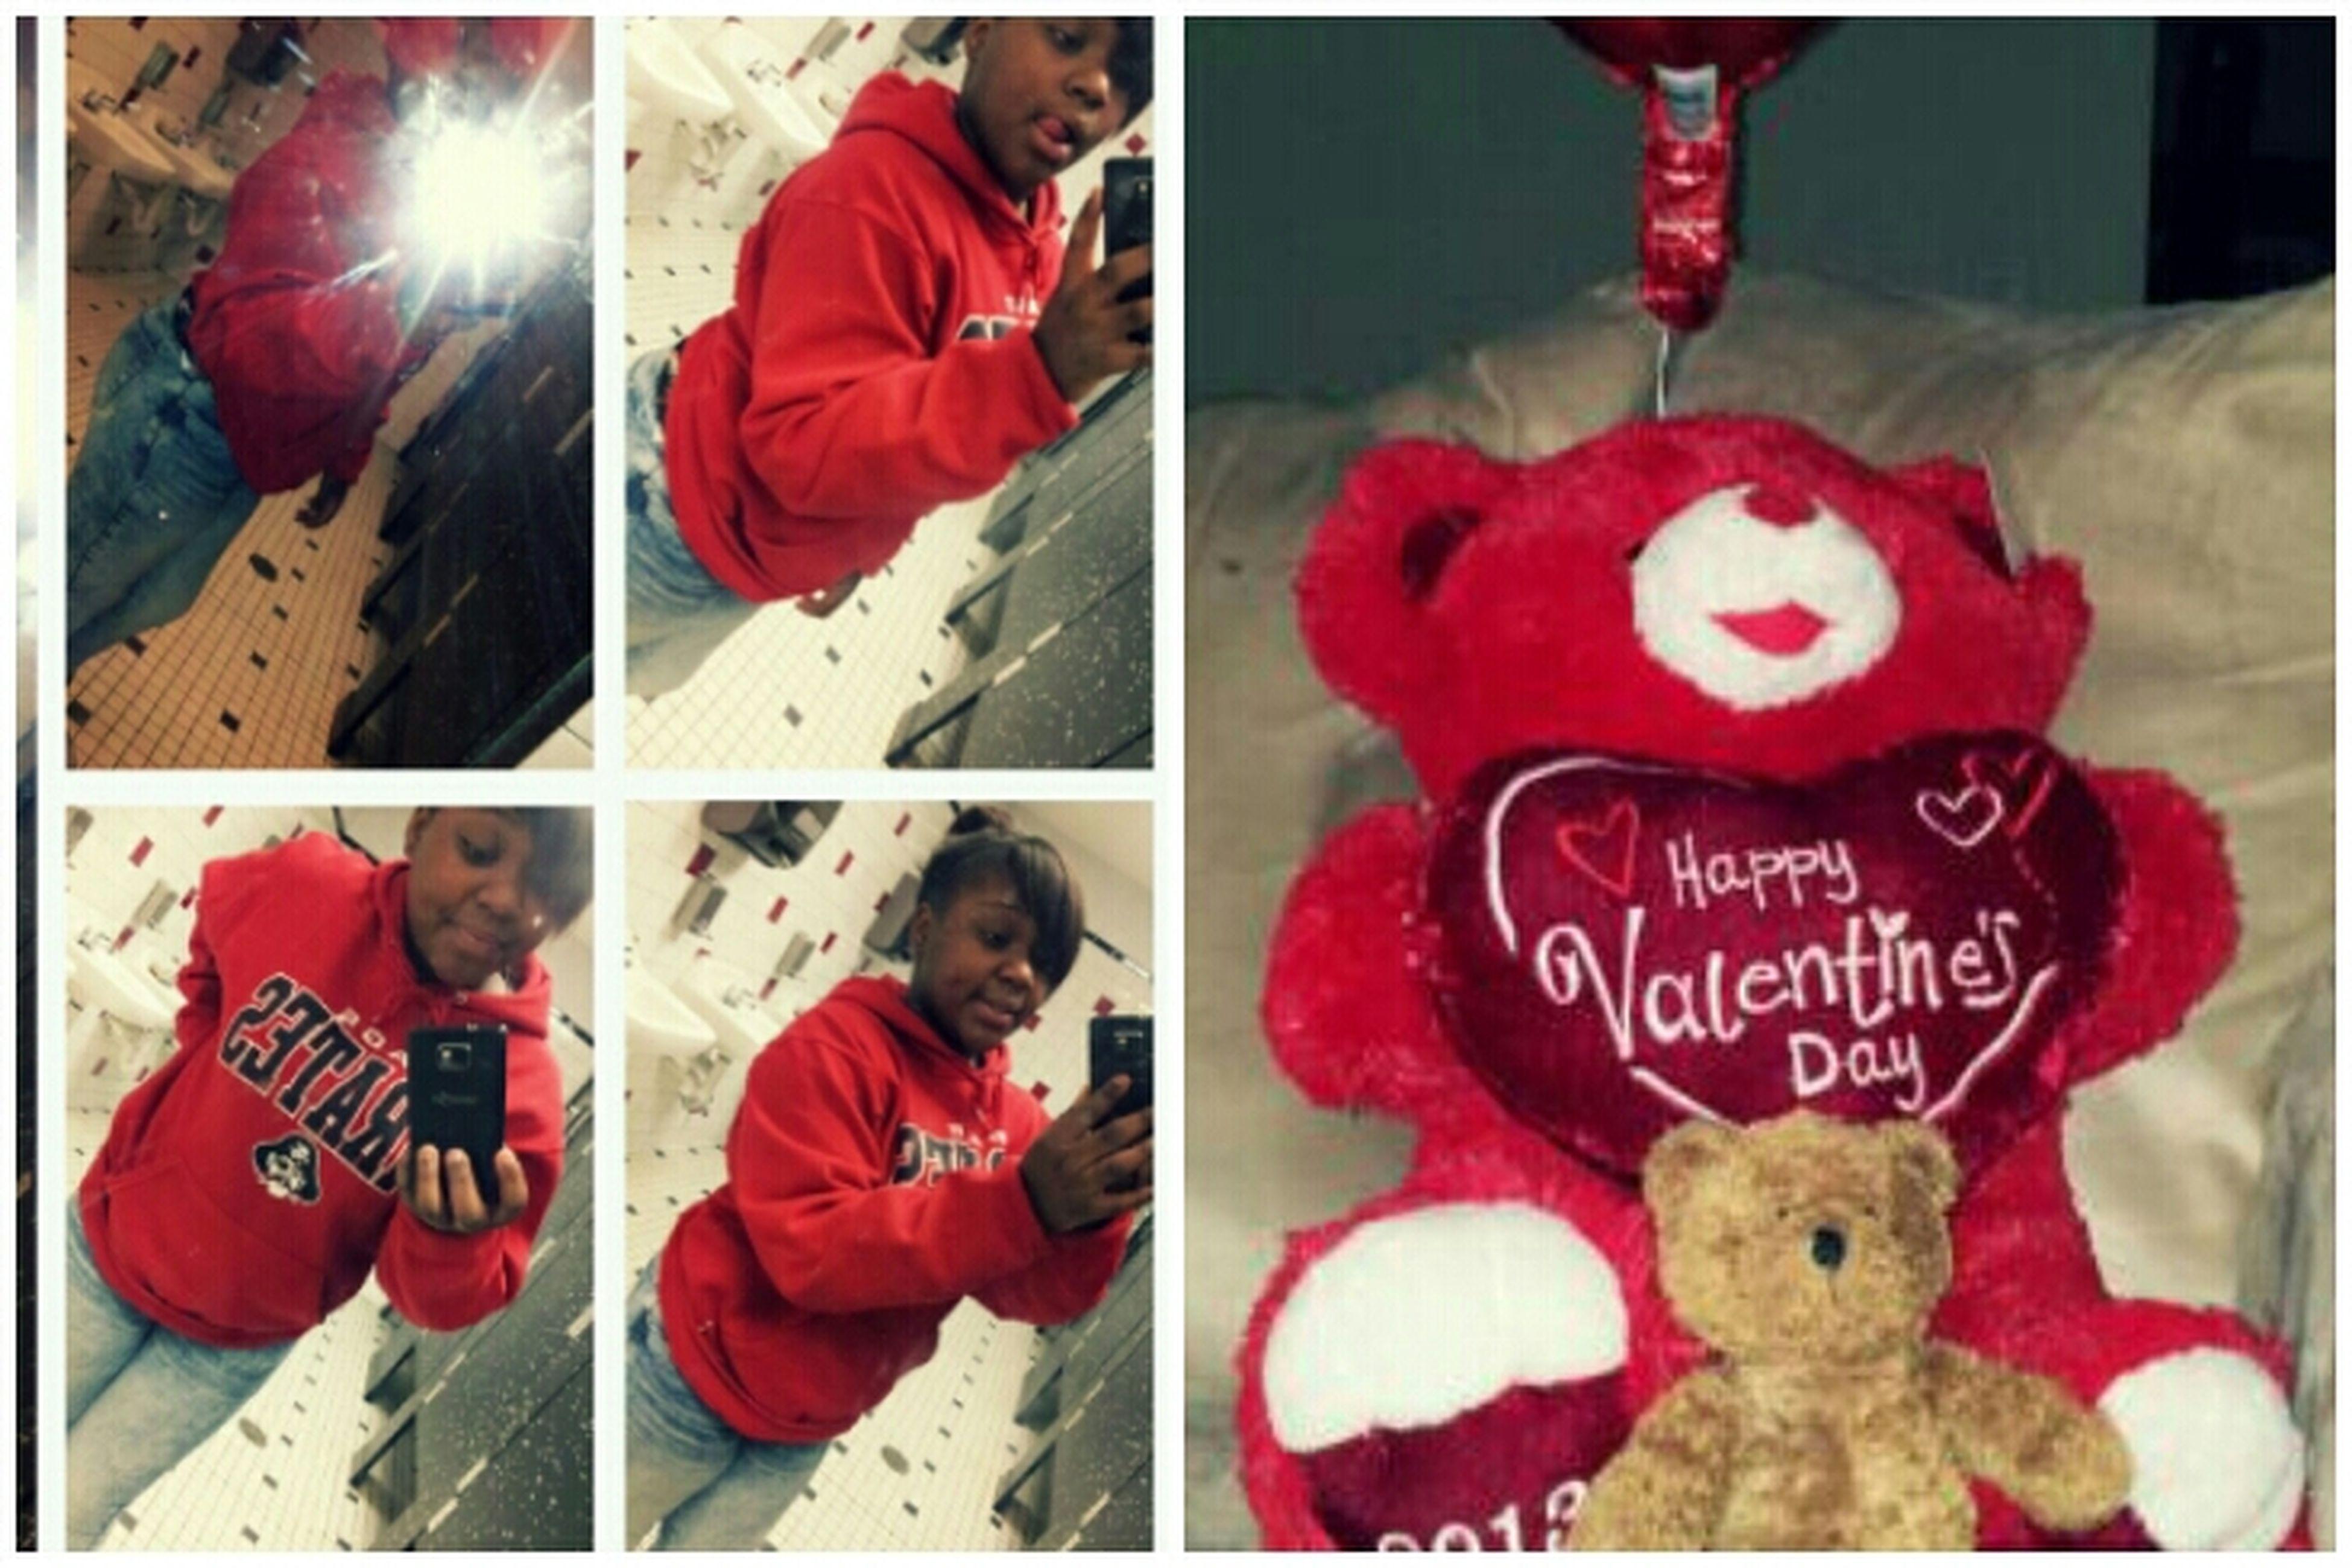 Happy Belated Valentines Day ((: